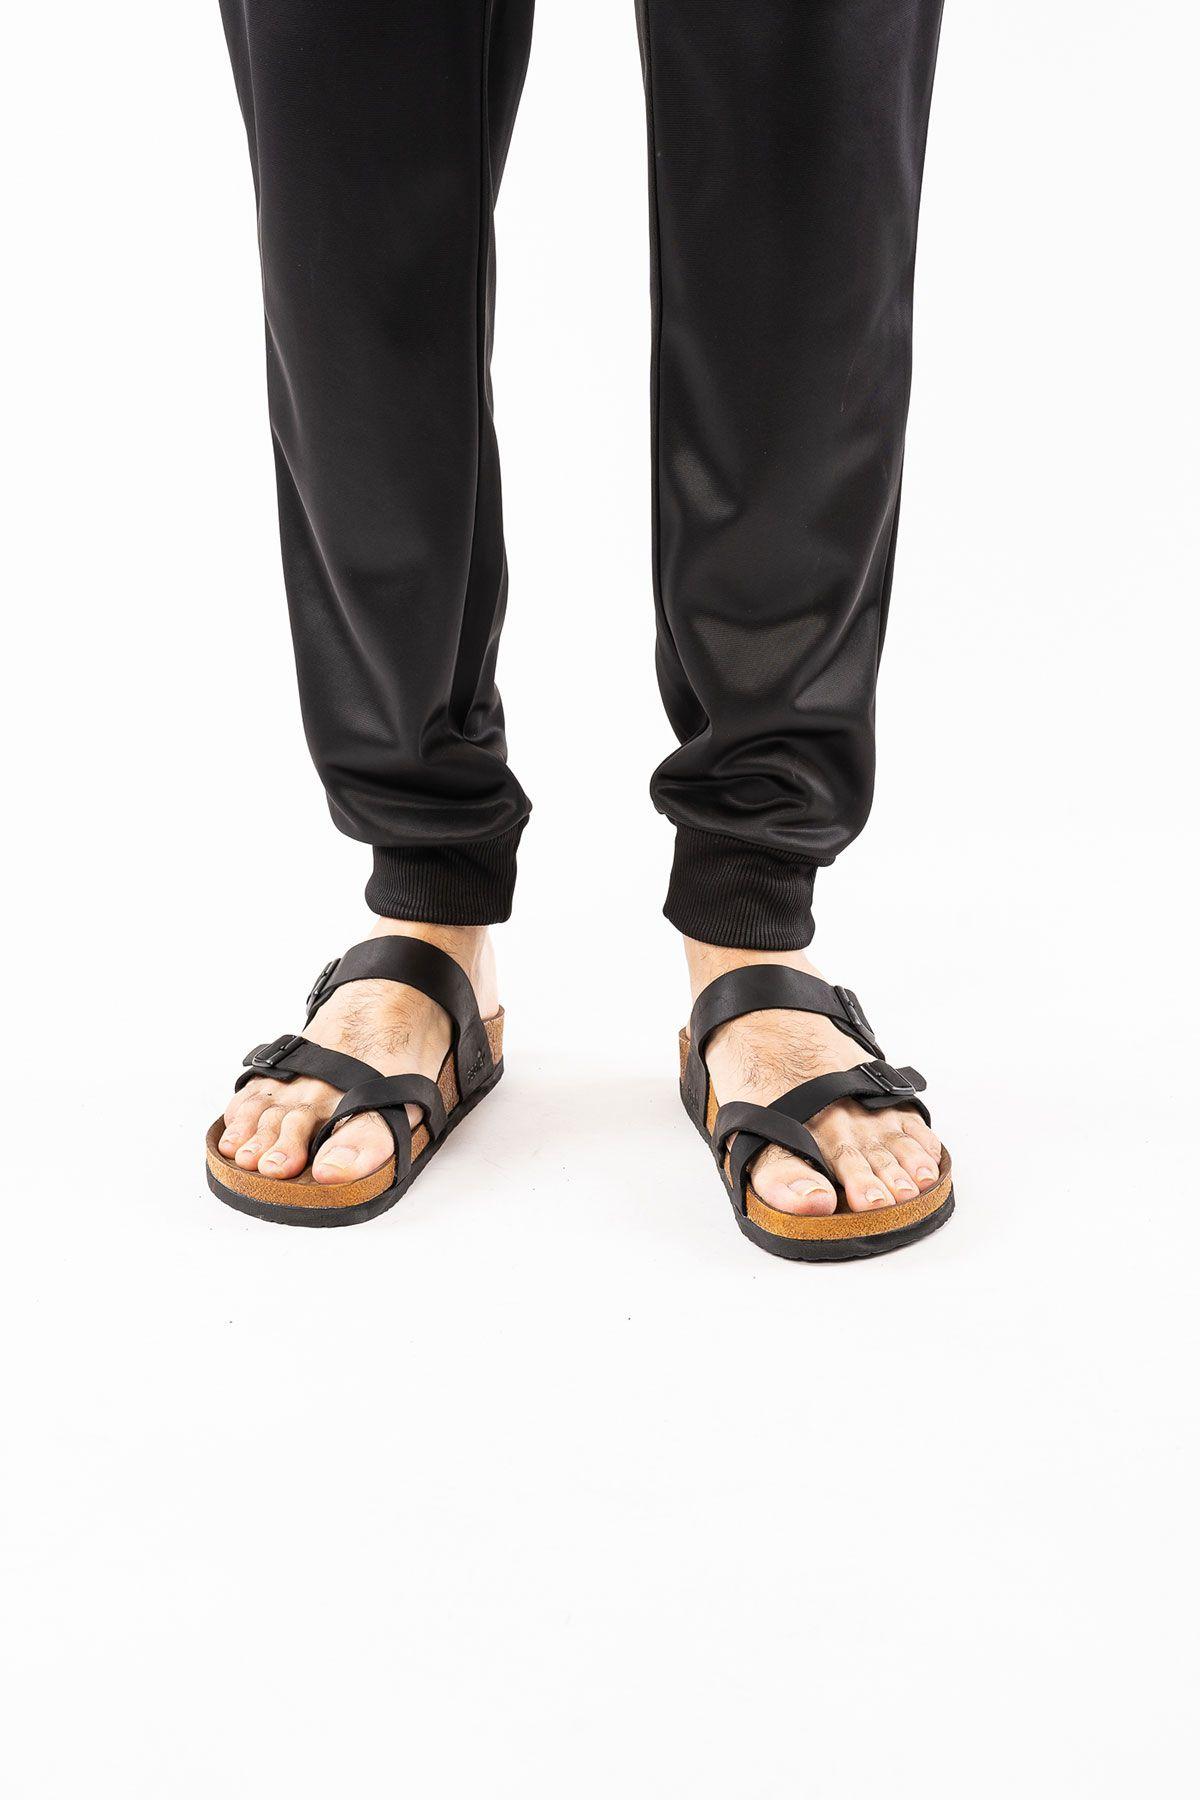 Pegia Genuine Leather Men's Slippers 215012 Black